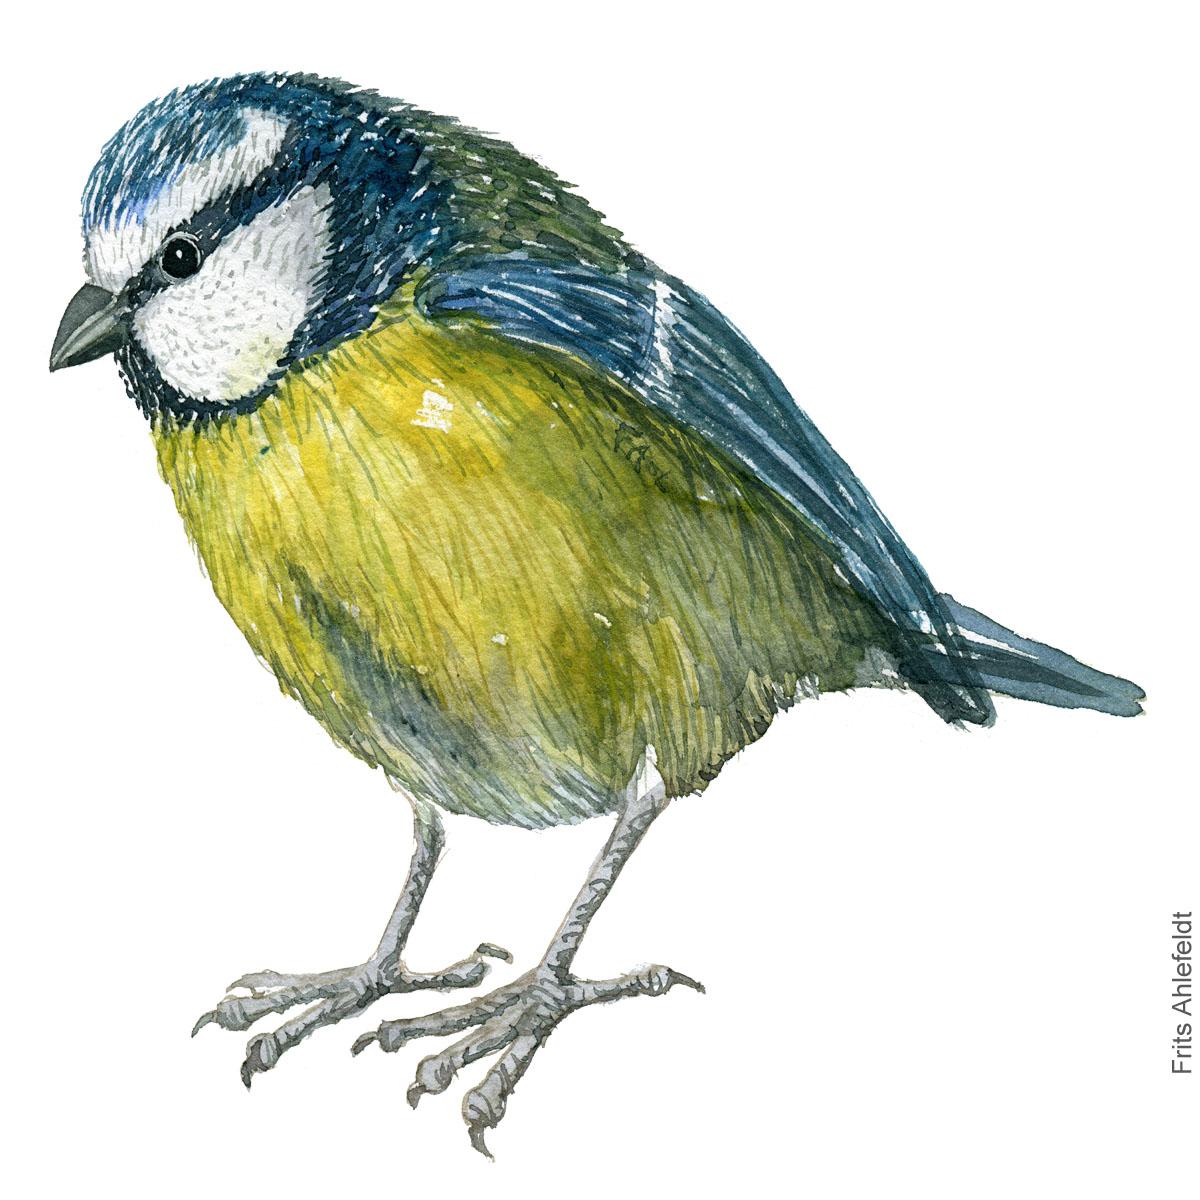 Blåmejse - Eurasian Blue tit bird watercolor. Akvarel by Frits Ahlefeldt